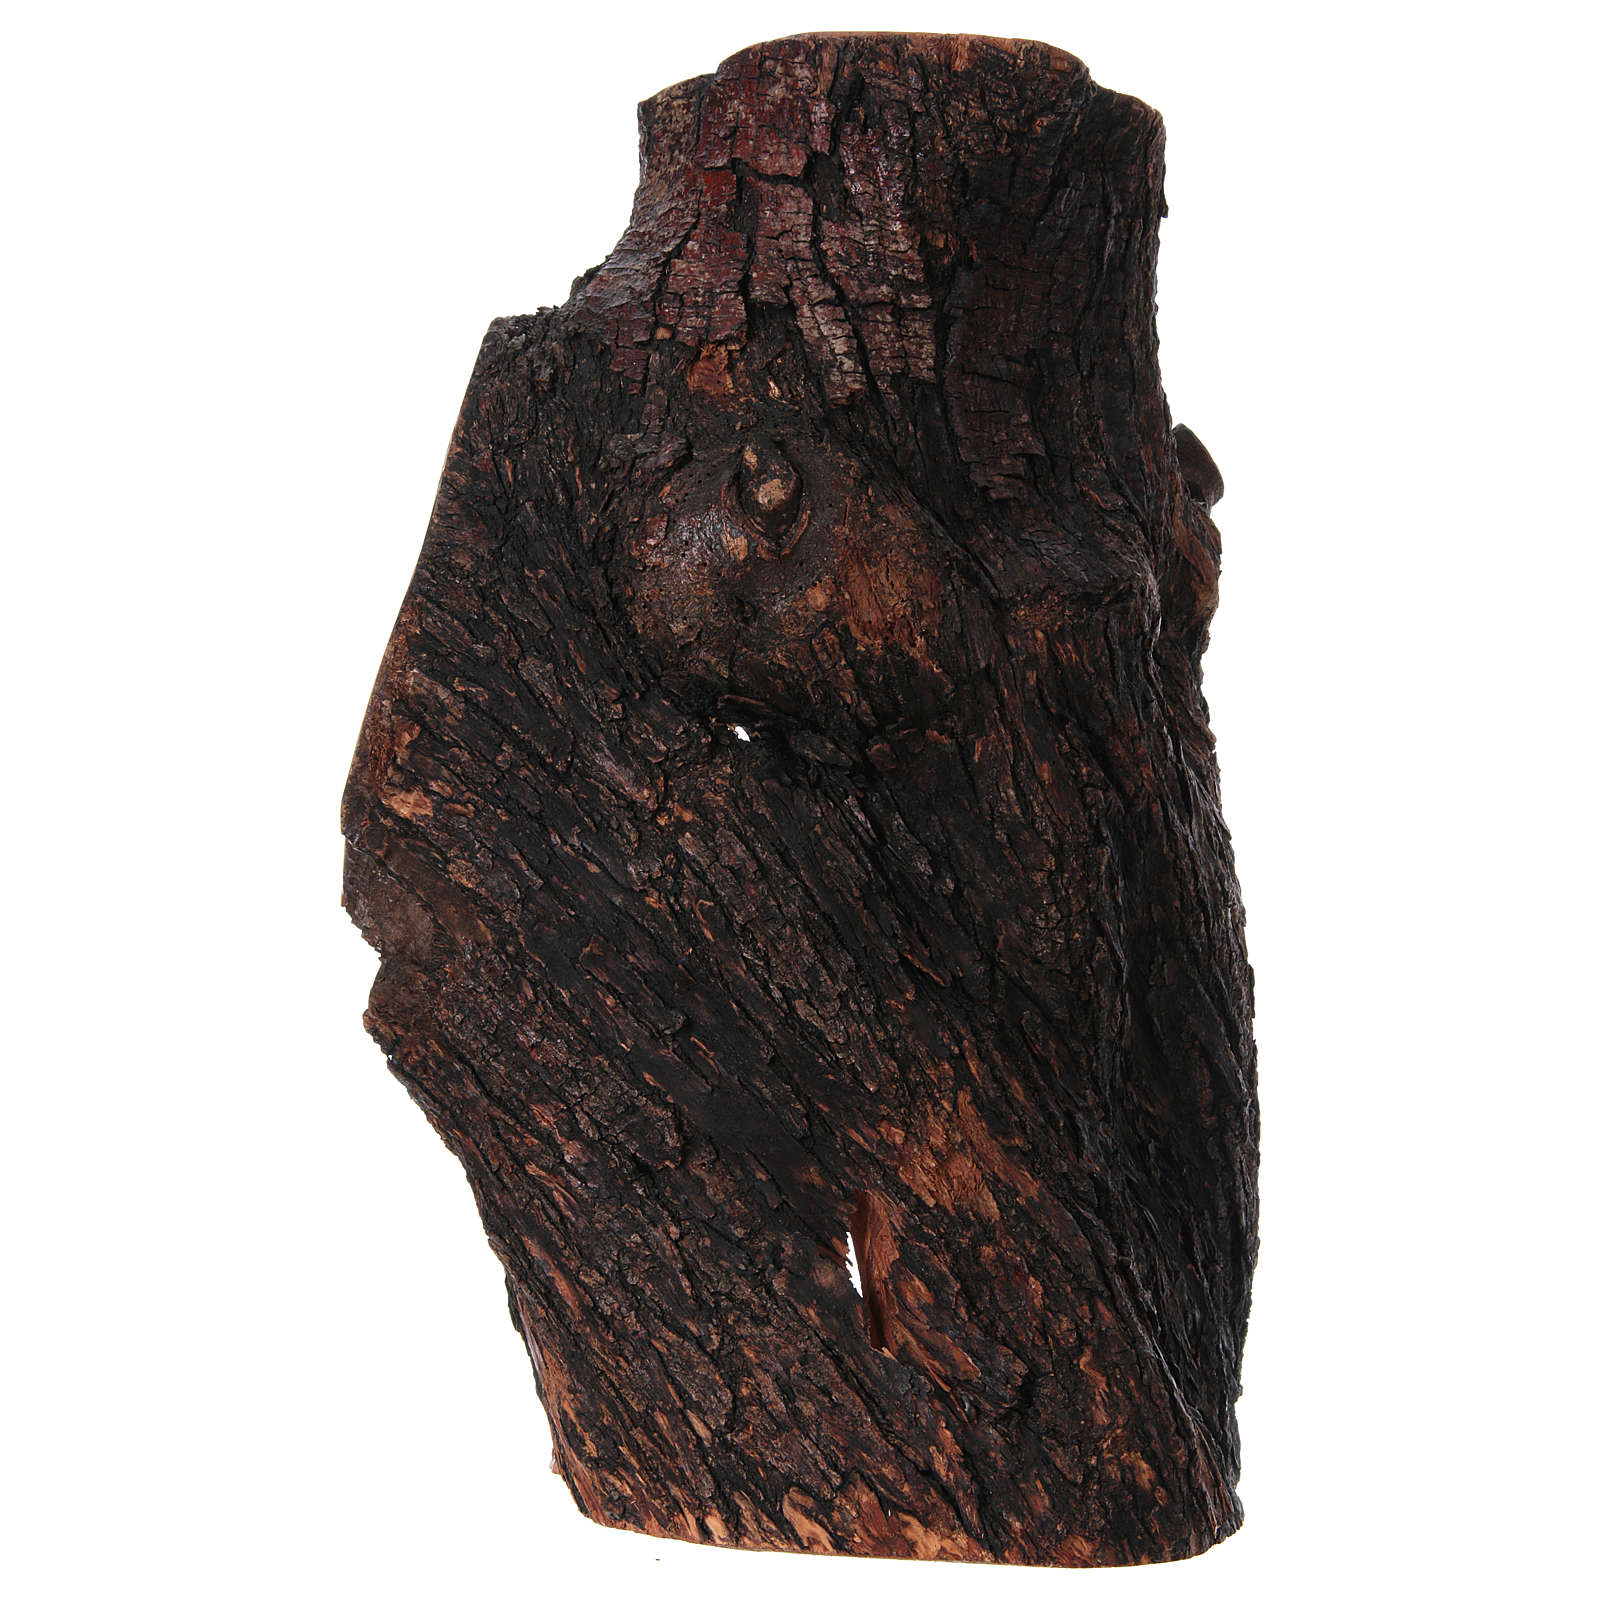 Presepe completo ulivo di Betlemme 21 cm in grotta naturale 45x30x30 cm 4